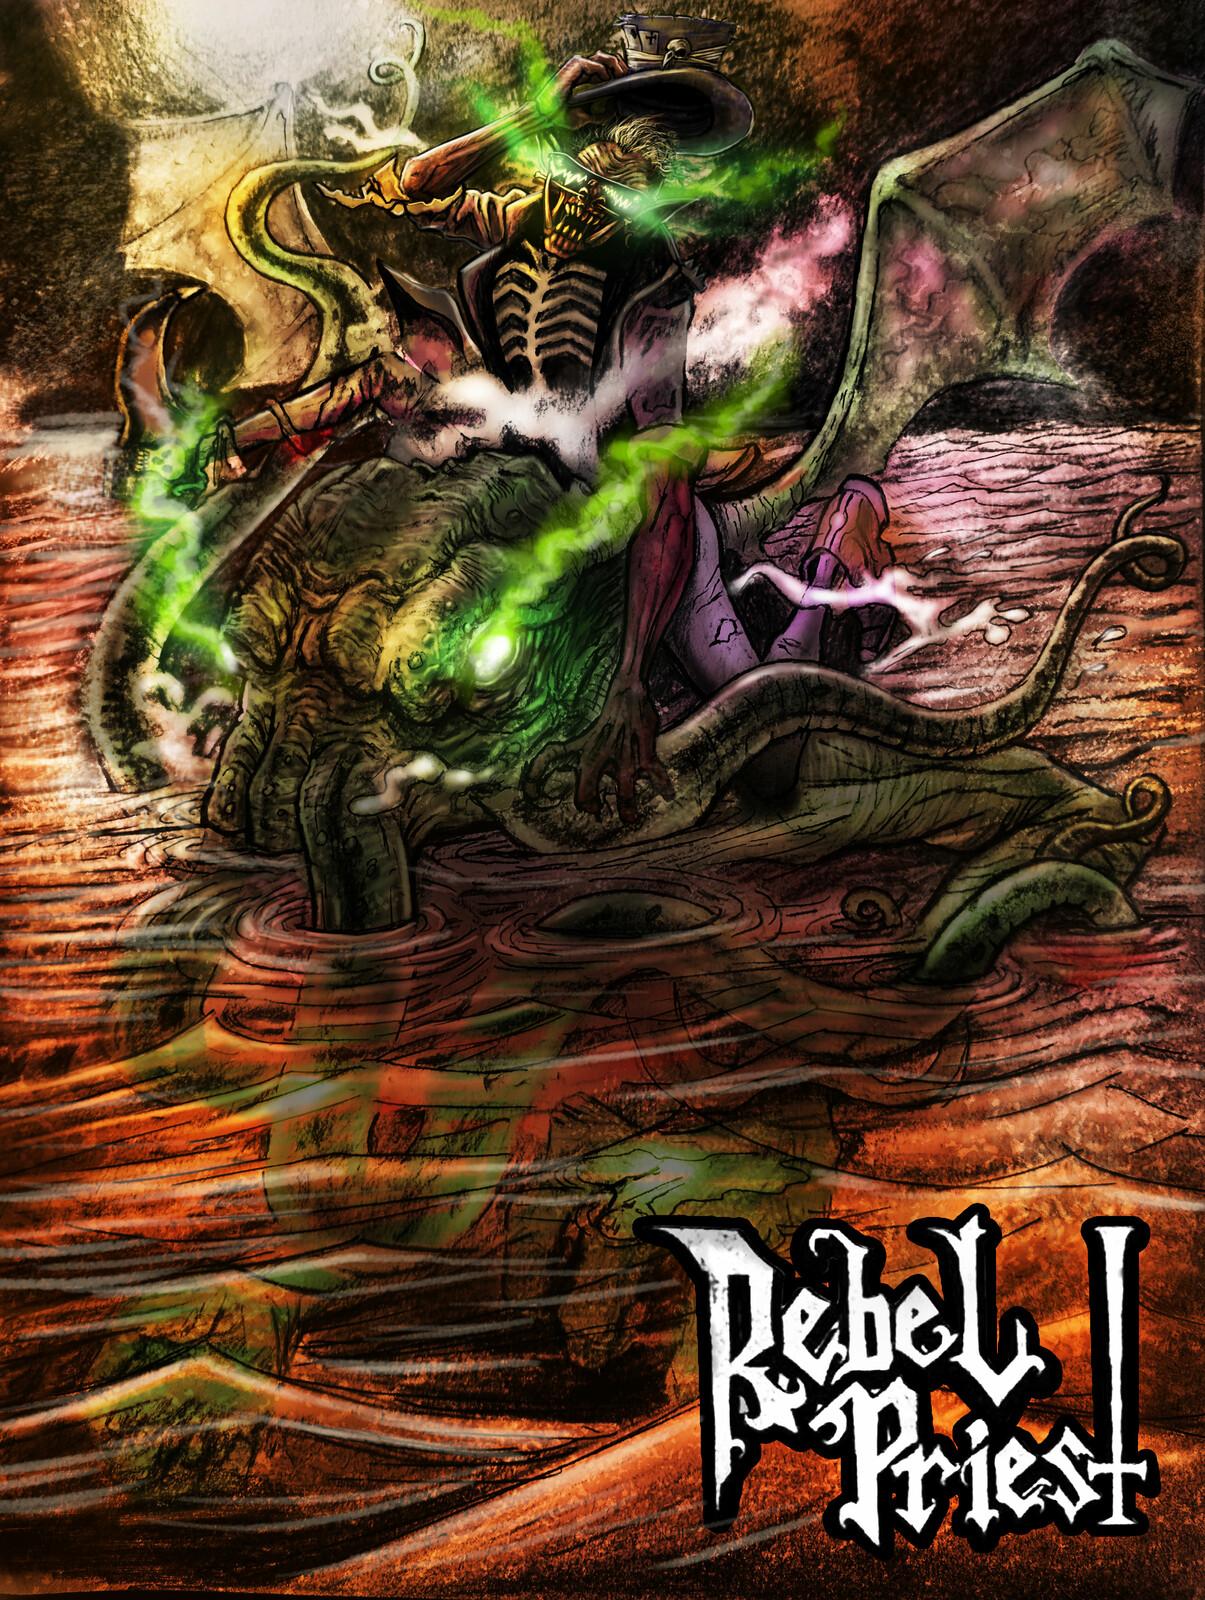 ilustration for Rebel Priest Band (https://rebelpriest.bandcamp.com/album/rlyeh-heavy)